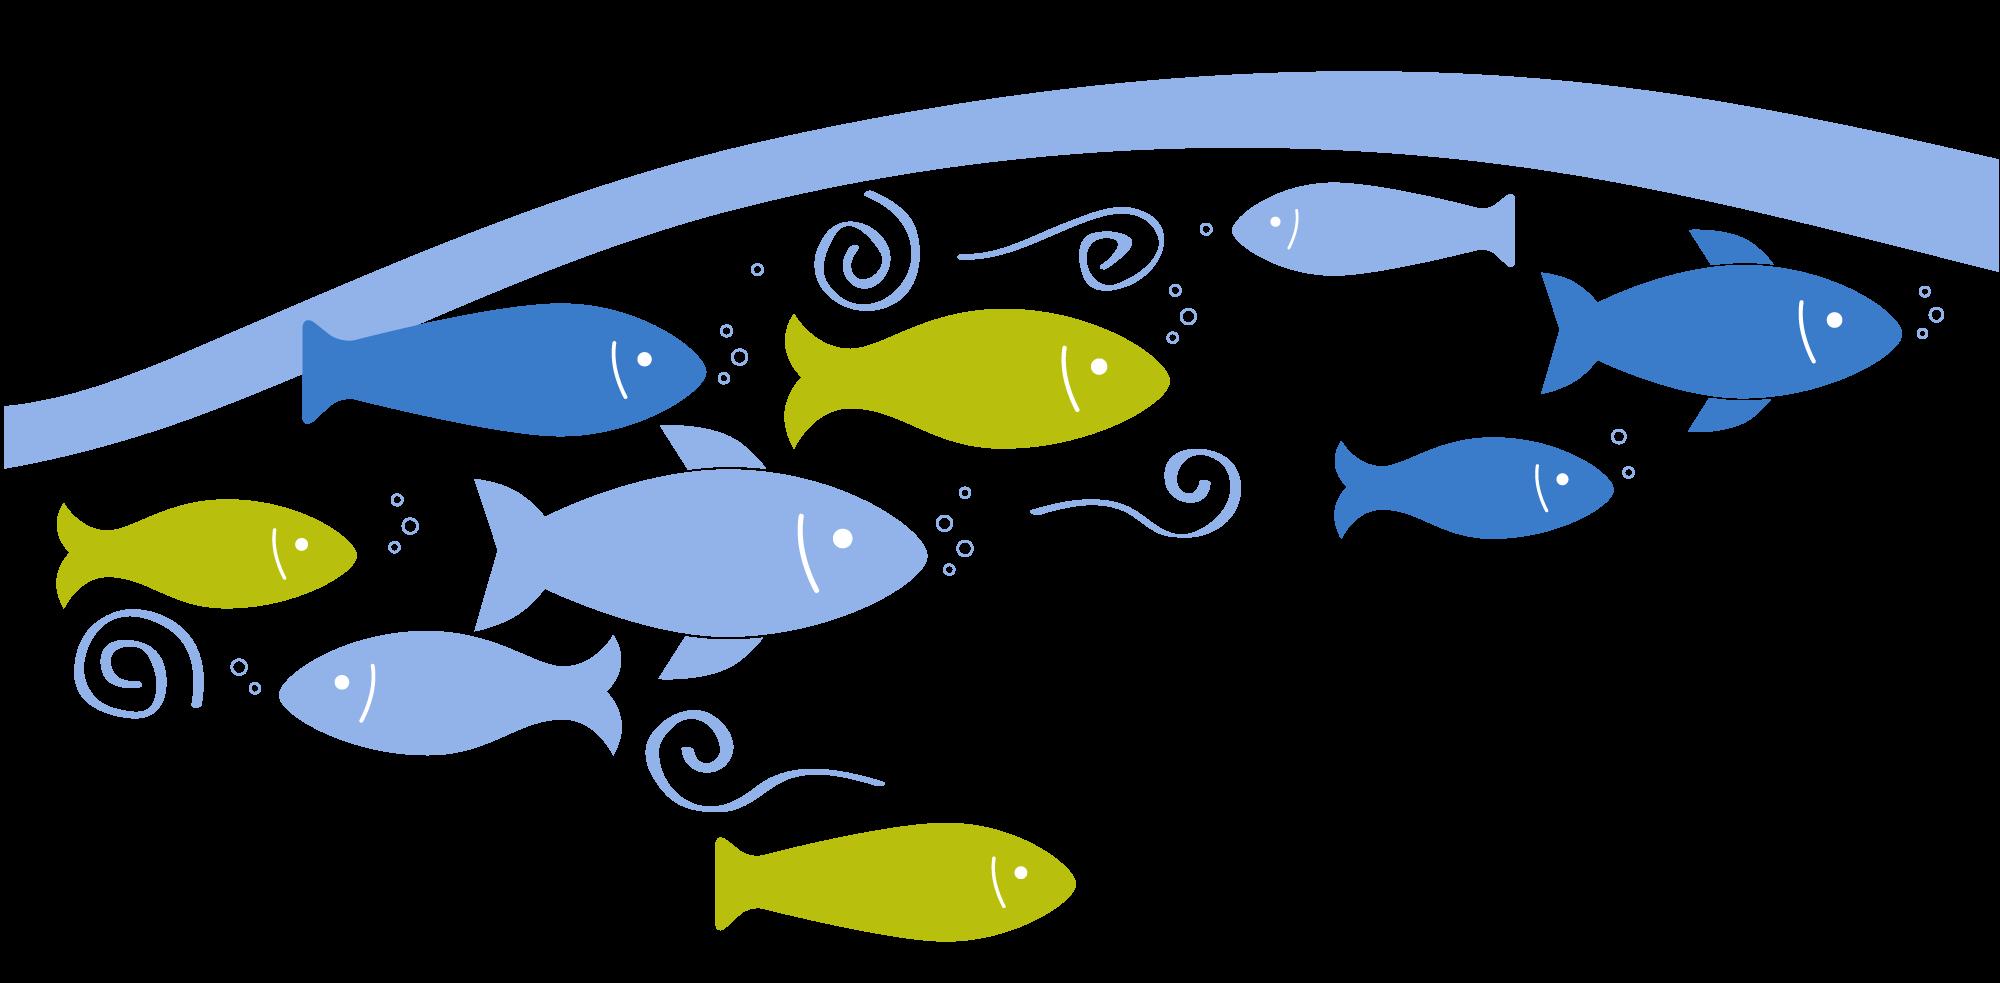 Evidence clipart report. Exploring downstream iriss fish